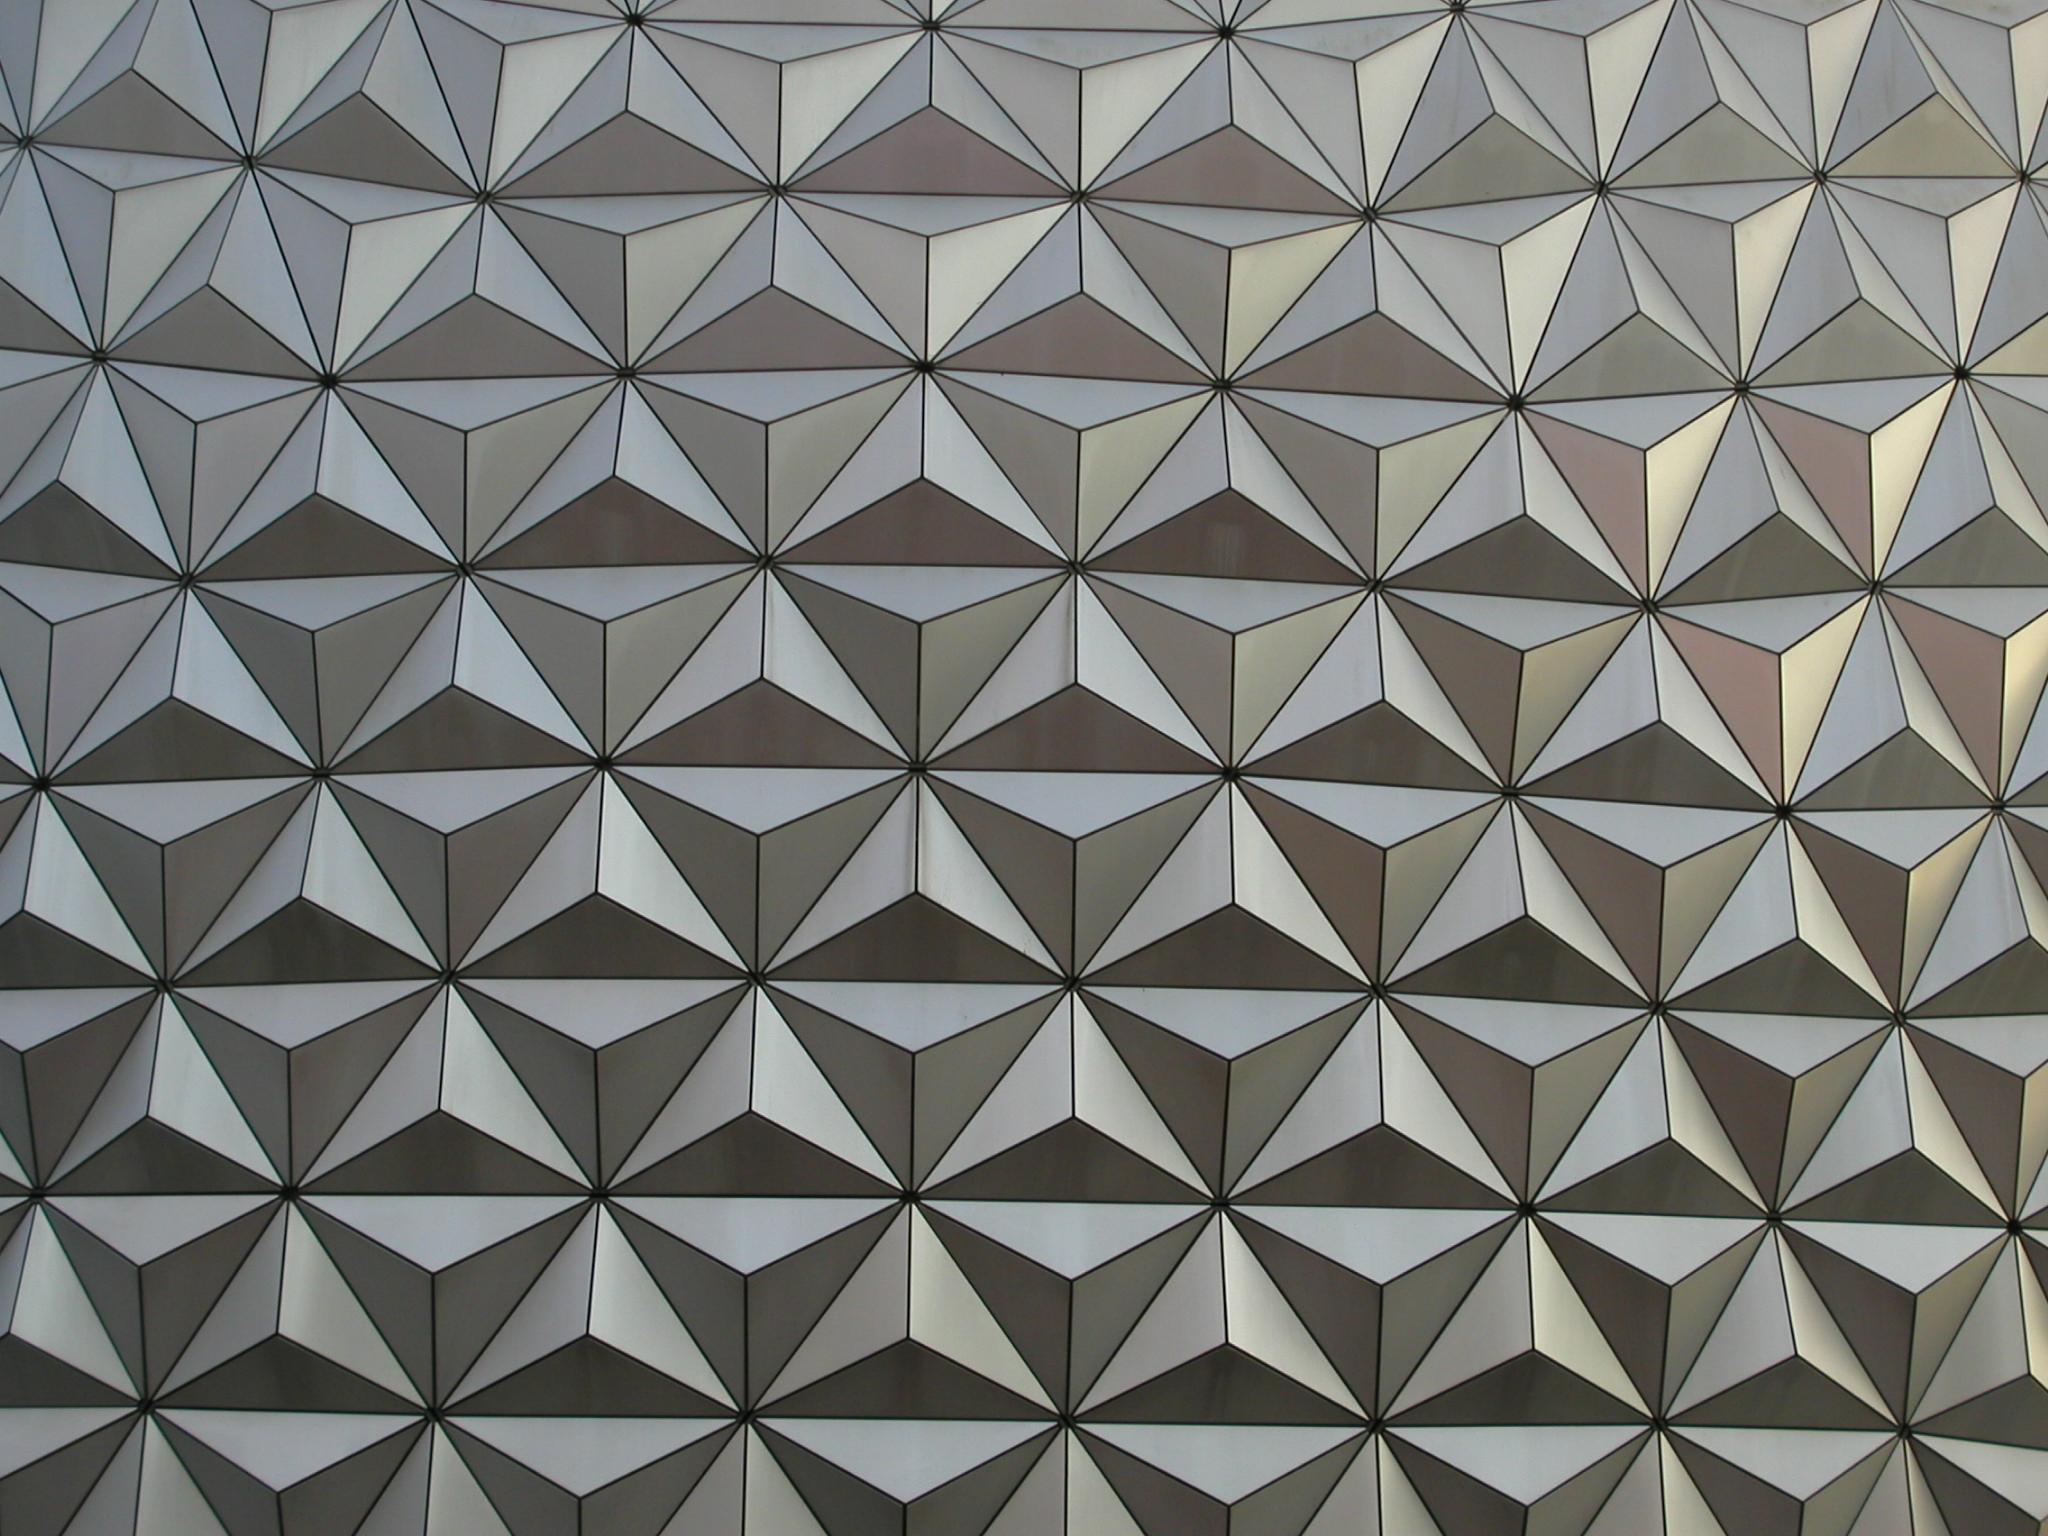 file spaceship earth tiles wide jpg wikimedia commons